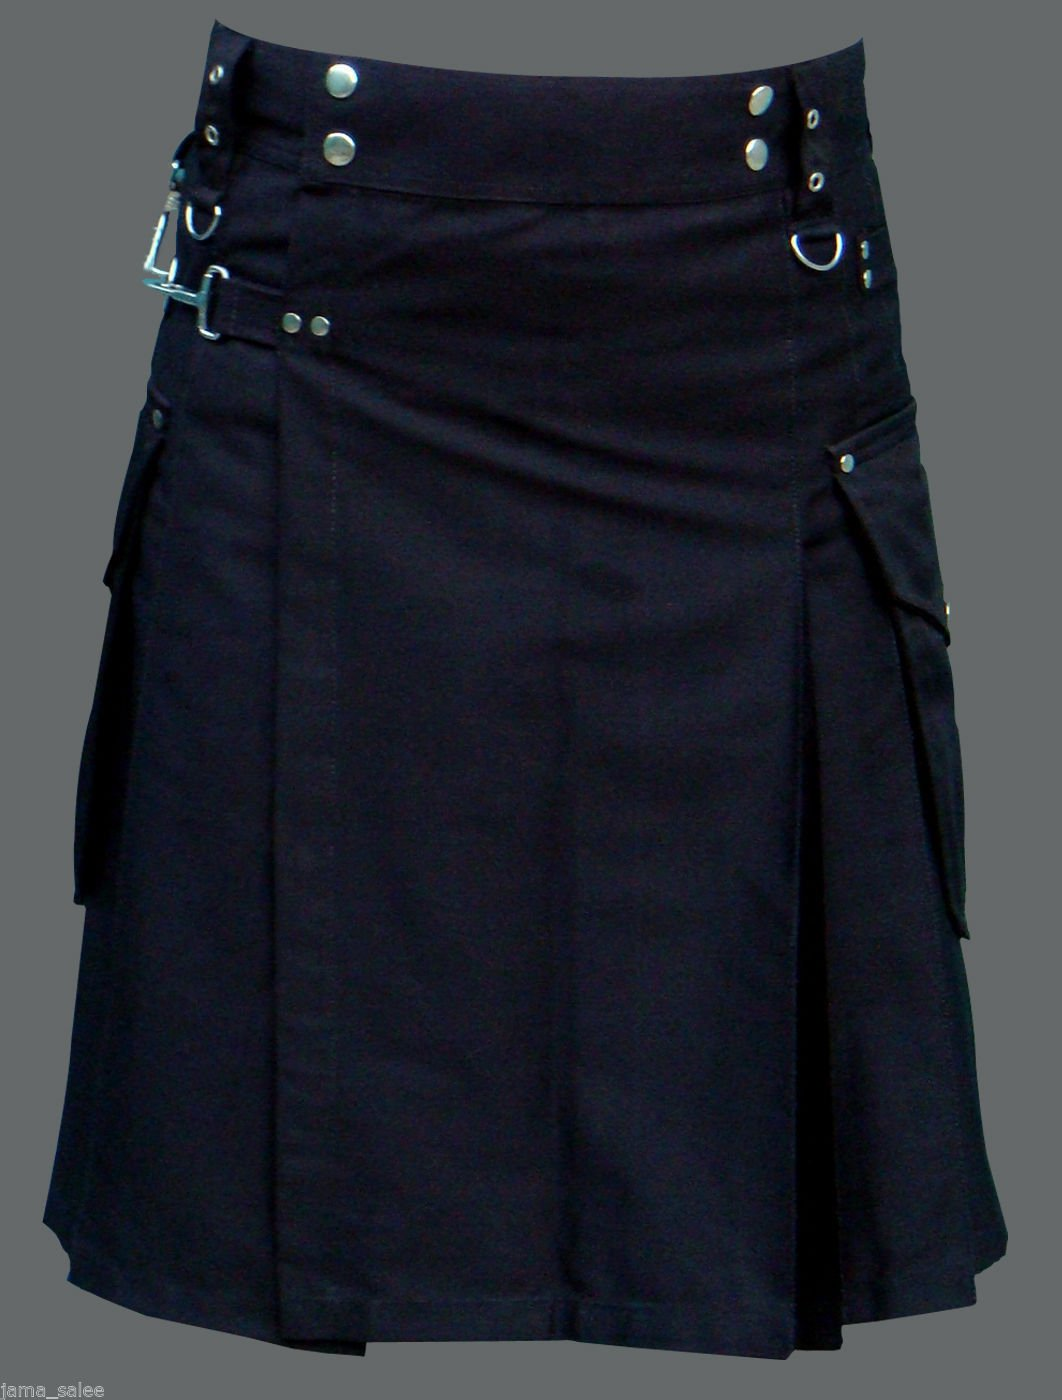 Deluxe Black Cotton Kilt Handmade Utility Gothic Modern Kilt with Cargo Pockets Waist Size 32 to Fit